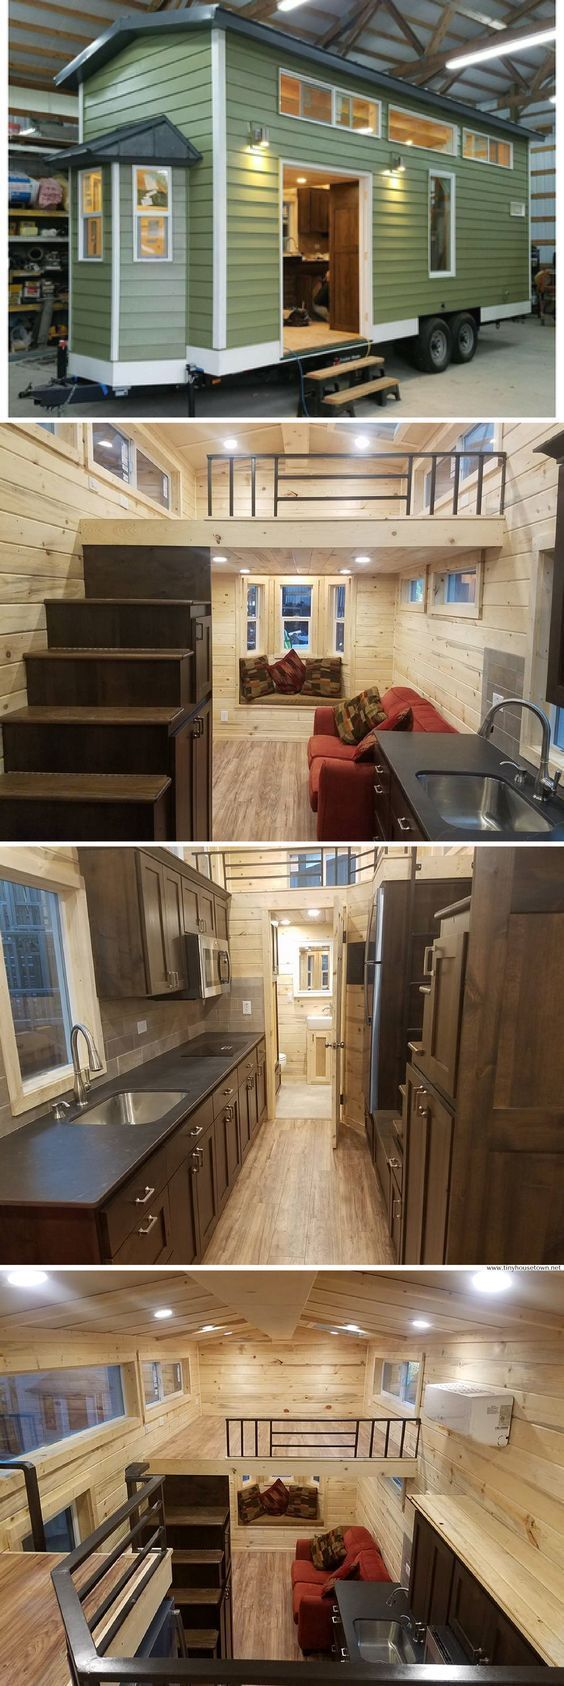 23 Best Tiny House Living